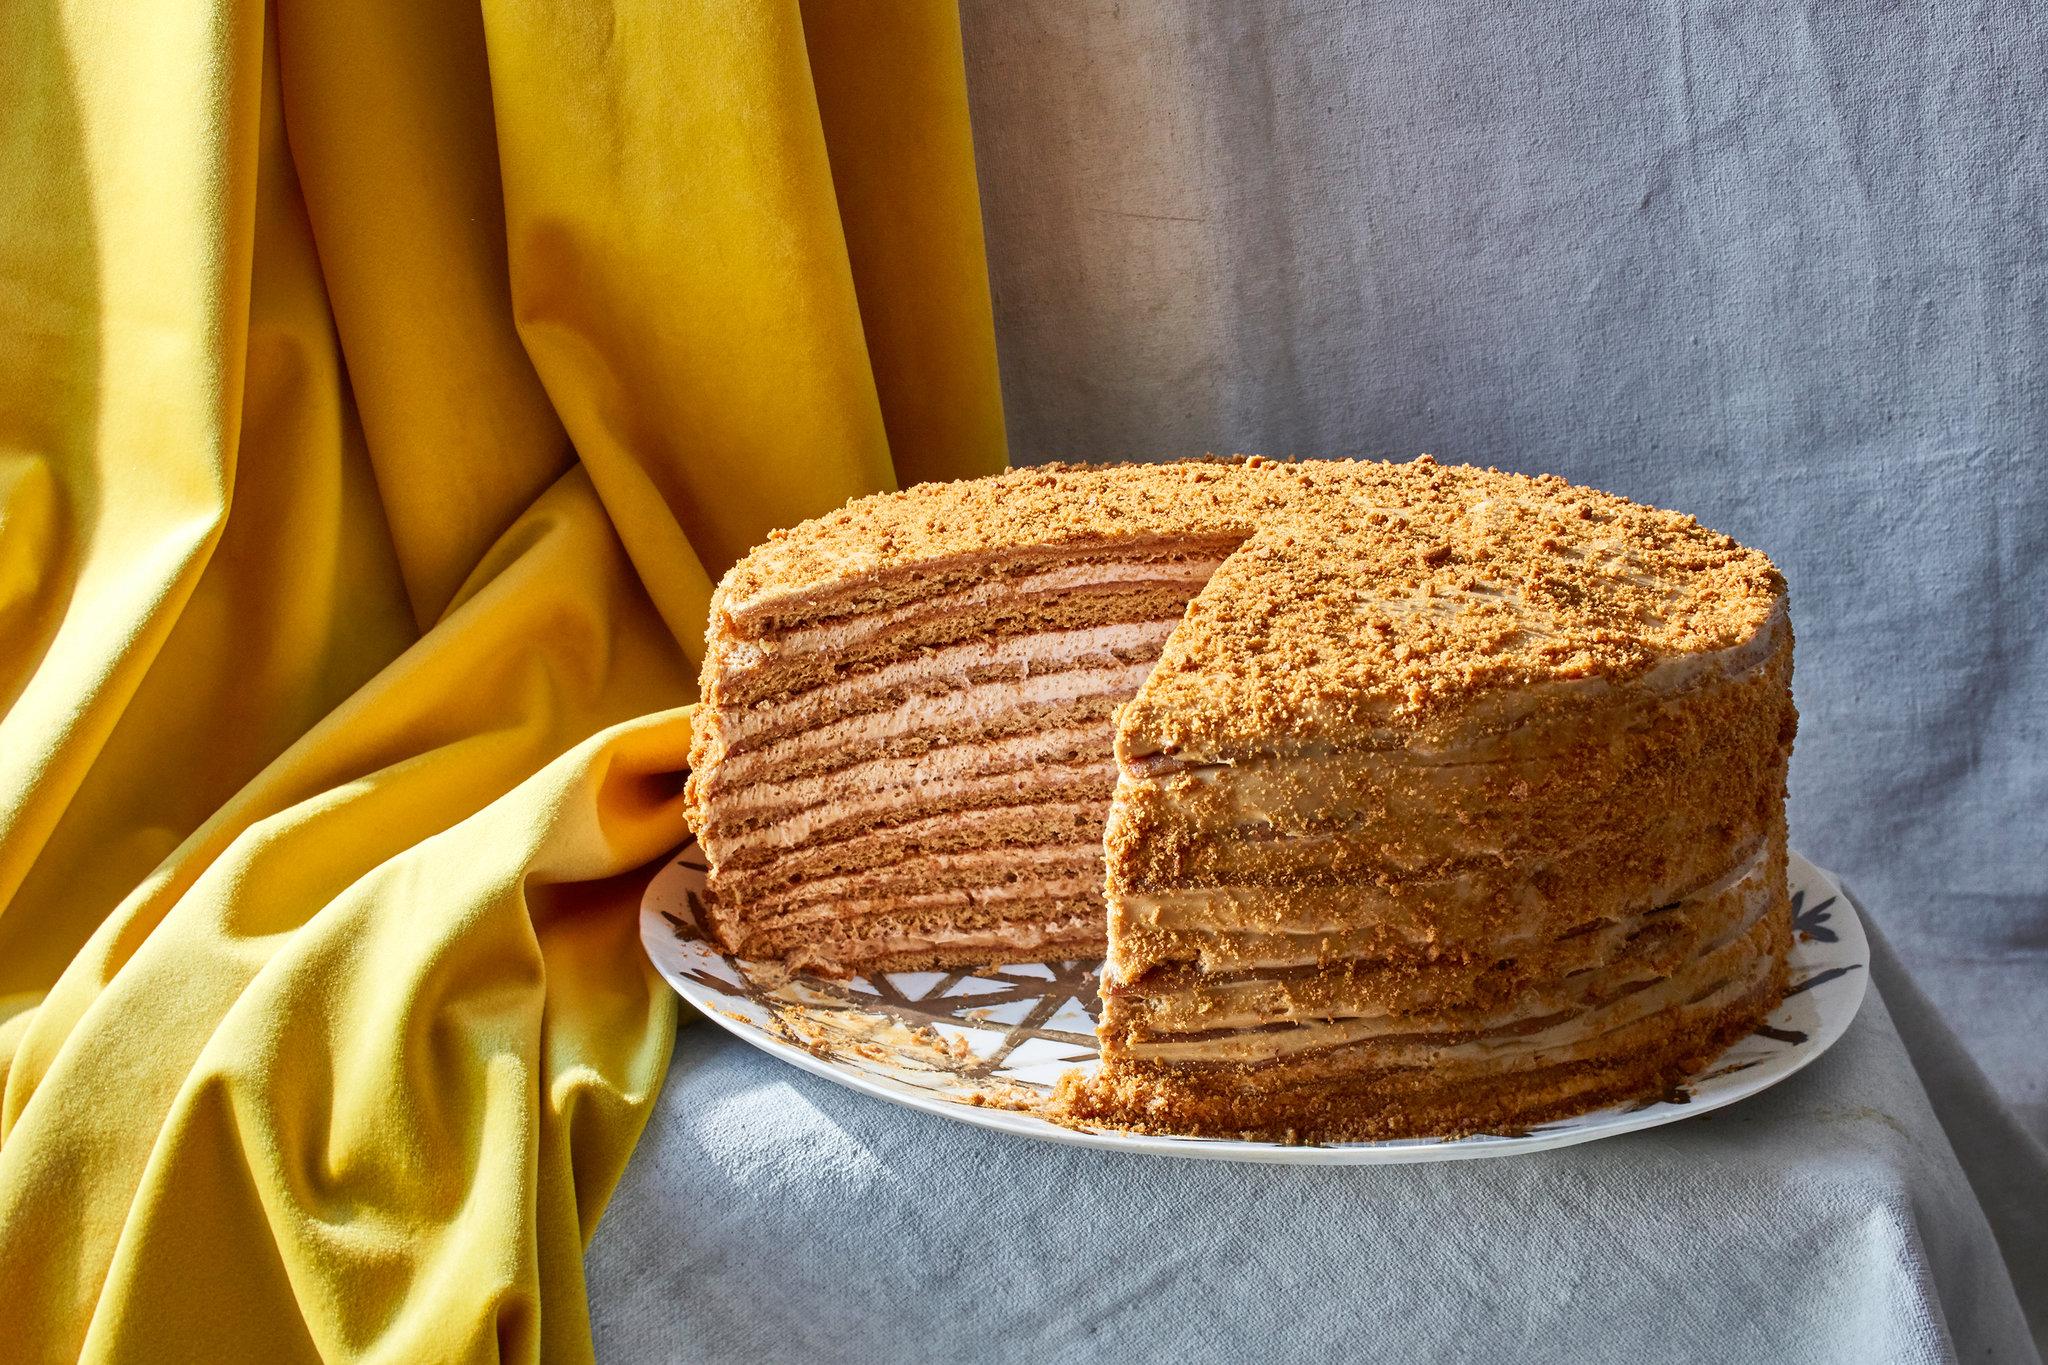 a Russian honey cake